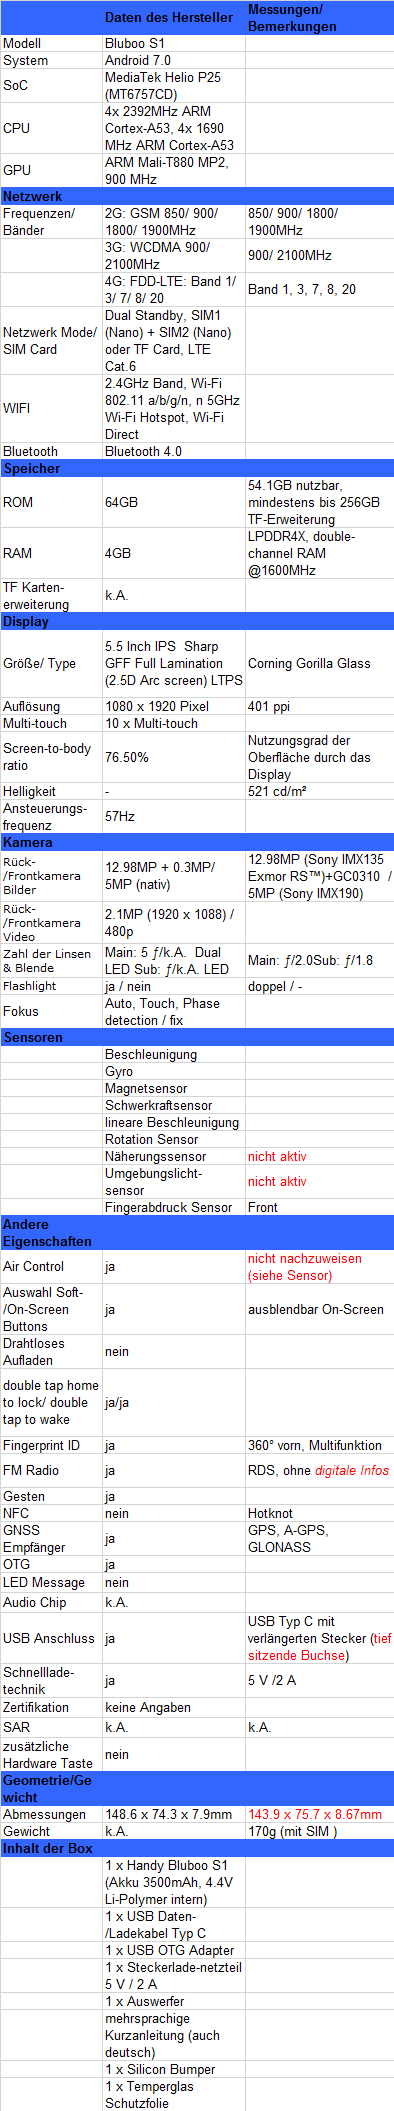 Bluboo S1 - Review - MediaTek Helio P25 (MT6757CD)  Tri Bezel Less 13MP (Sony IMX135 Exmor RS™)  / 5MP (Sony IMX190) - Test